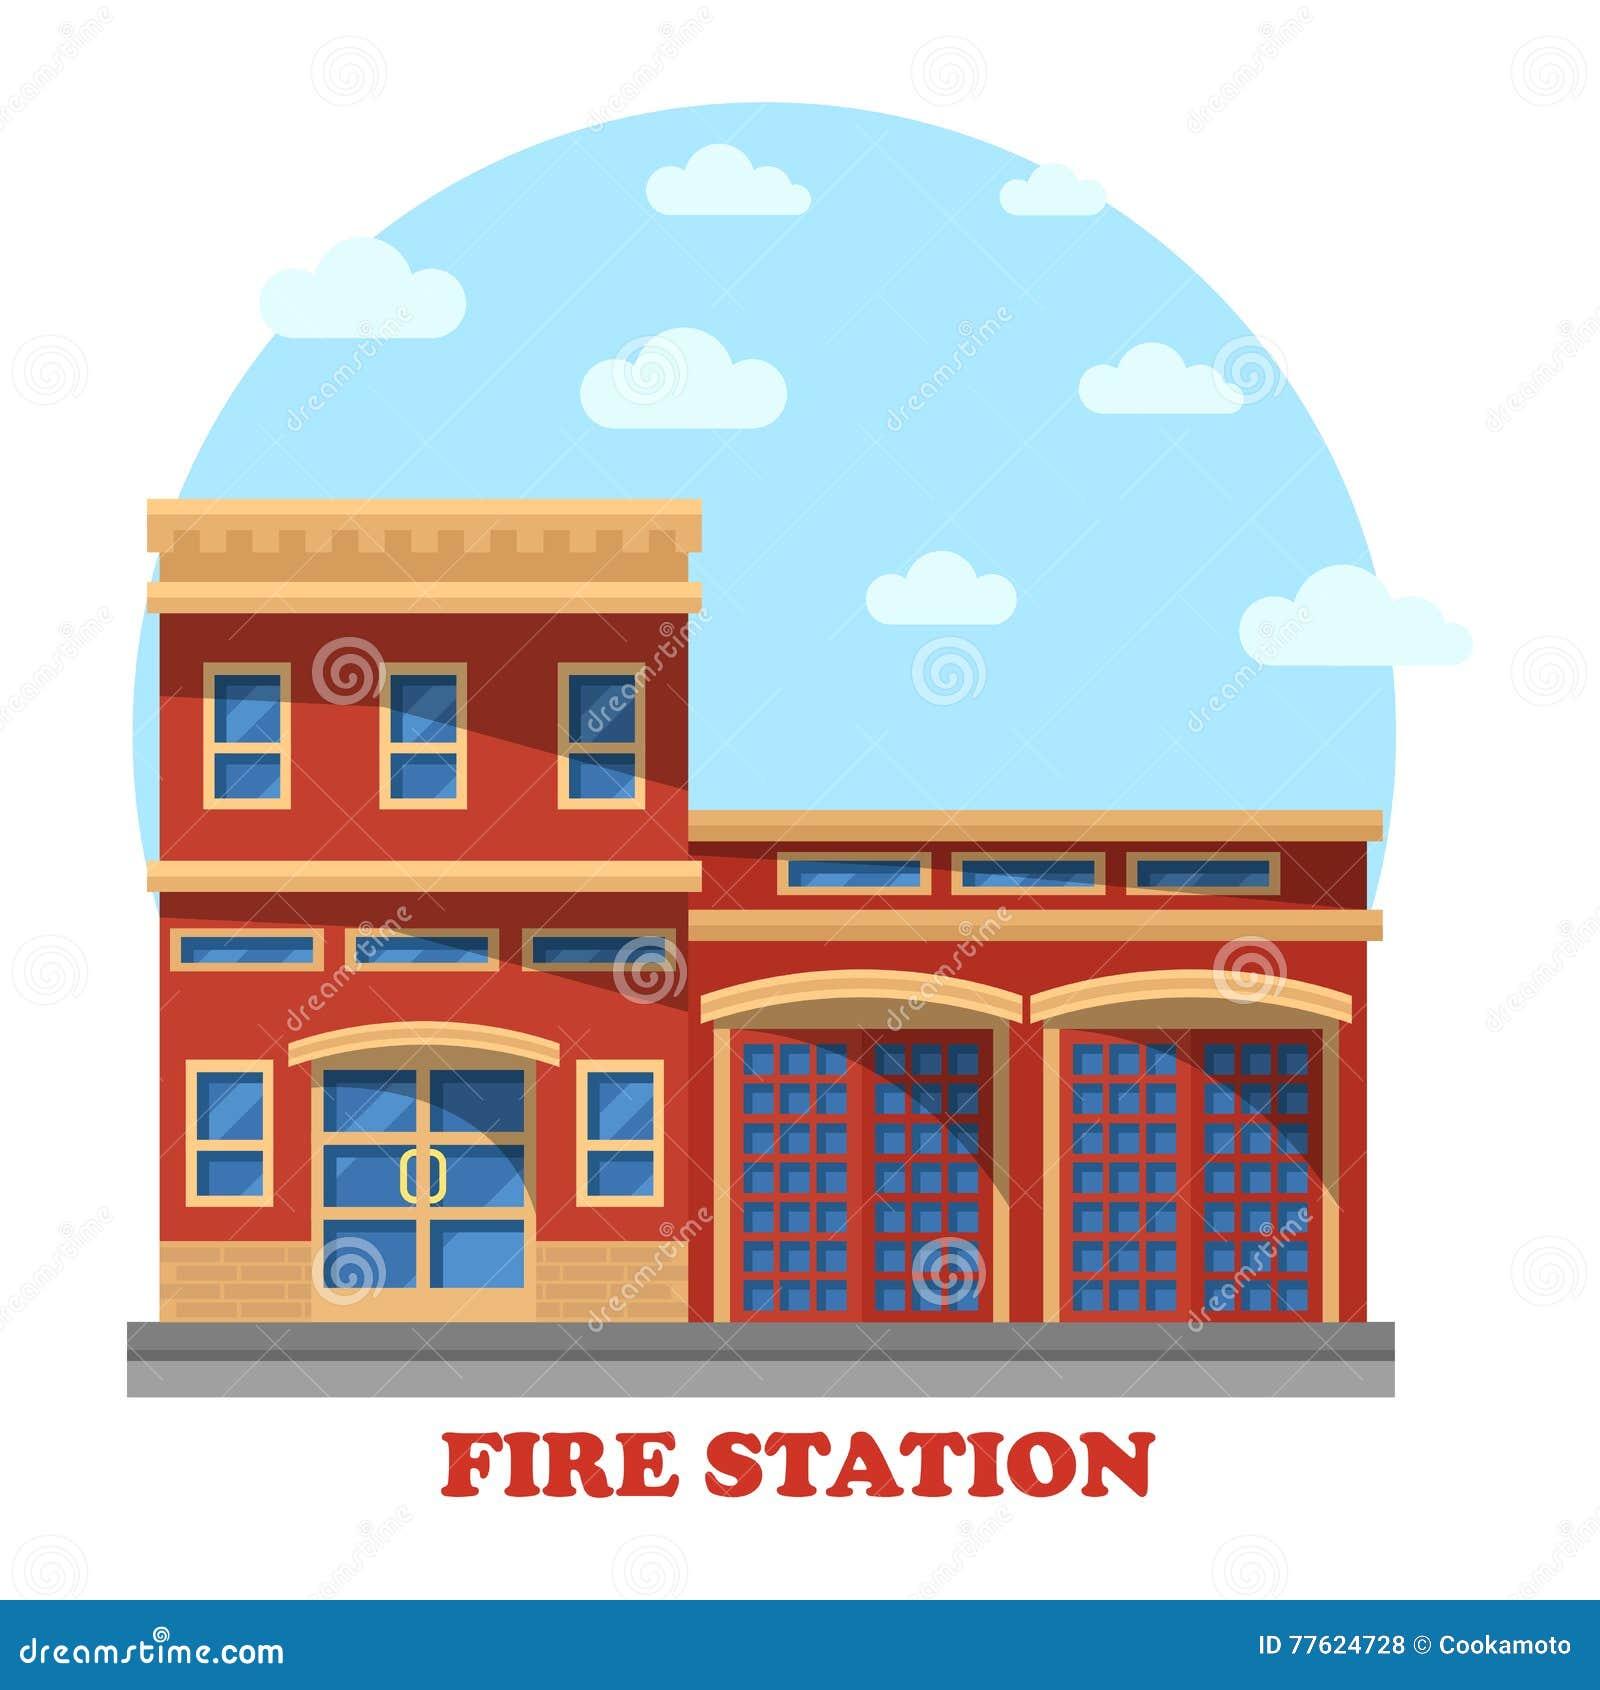 building construction fire service essay